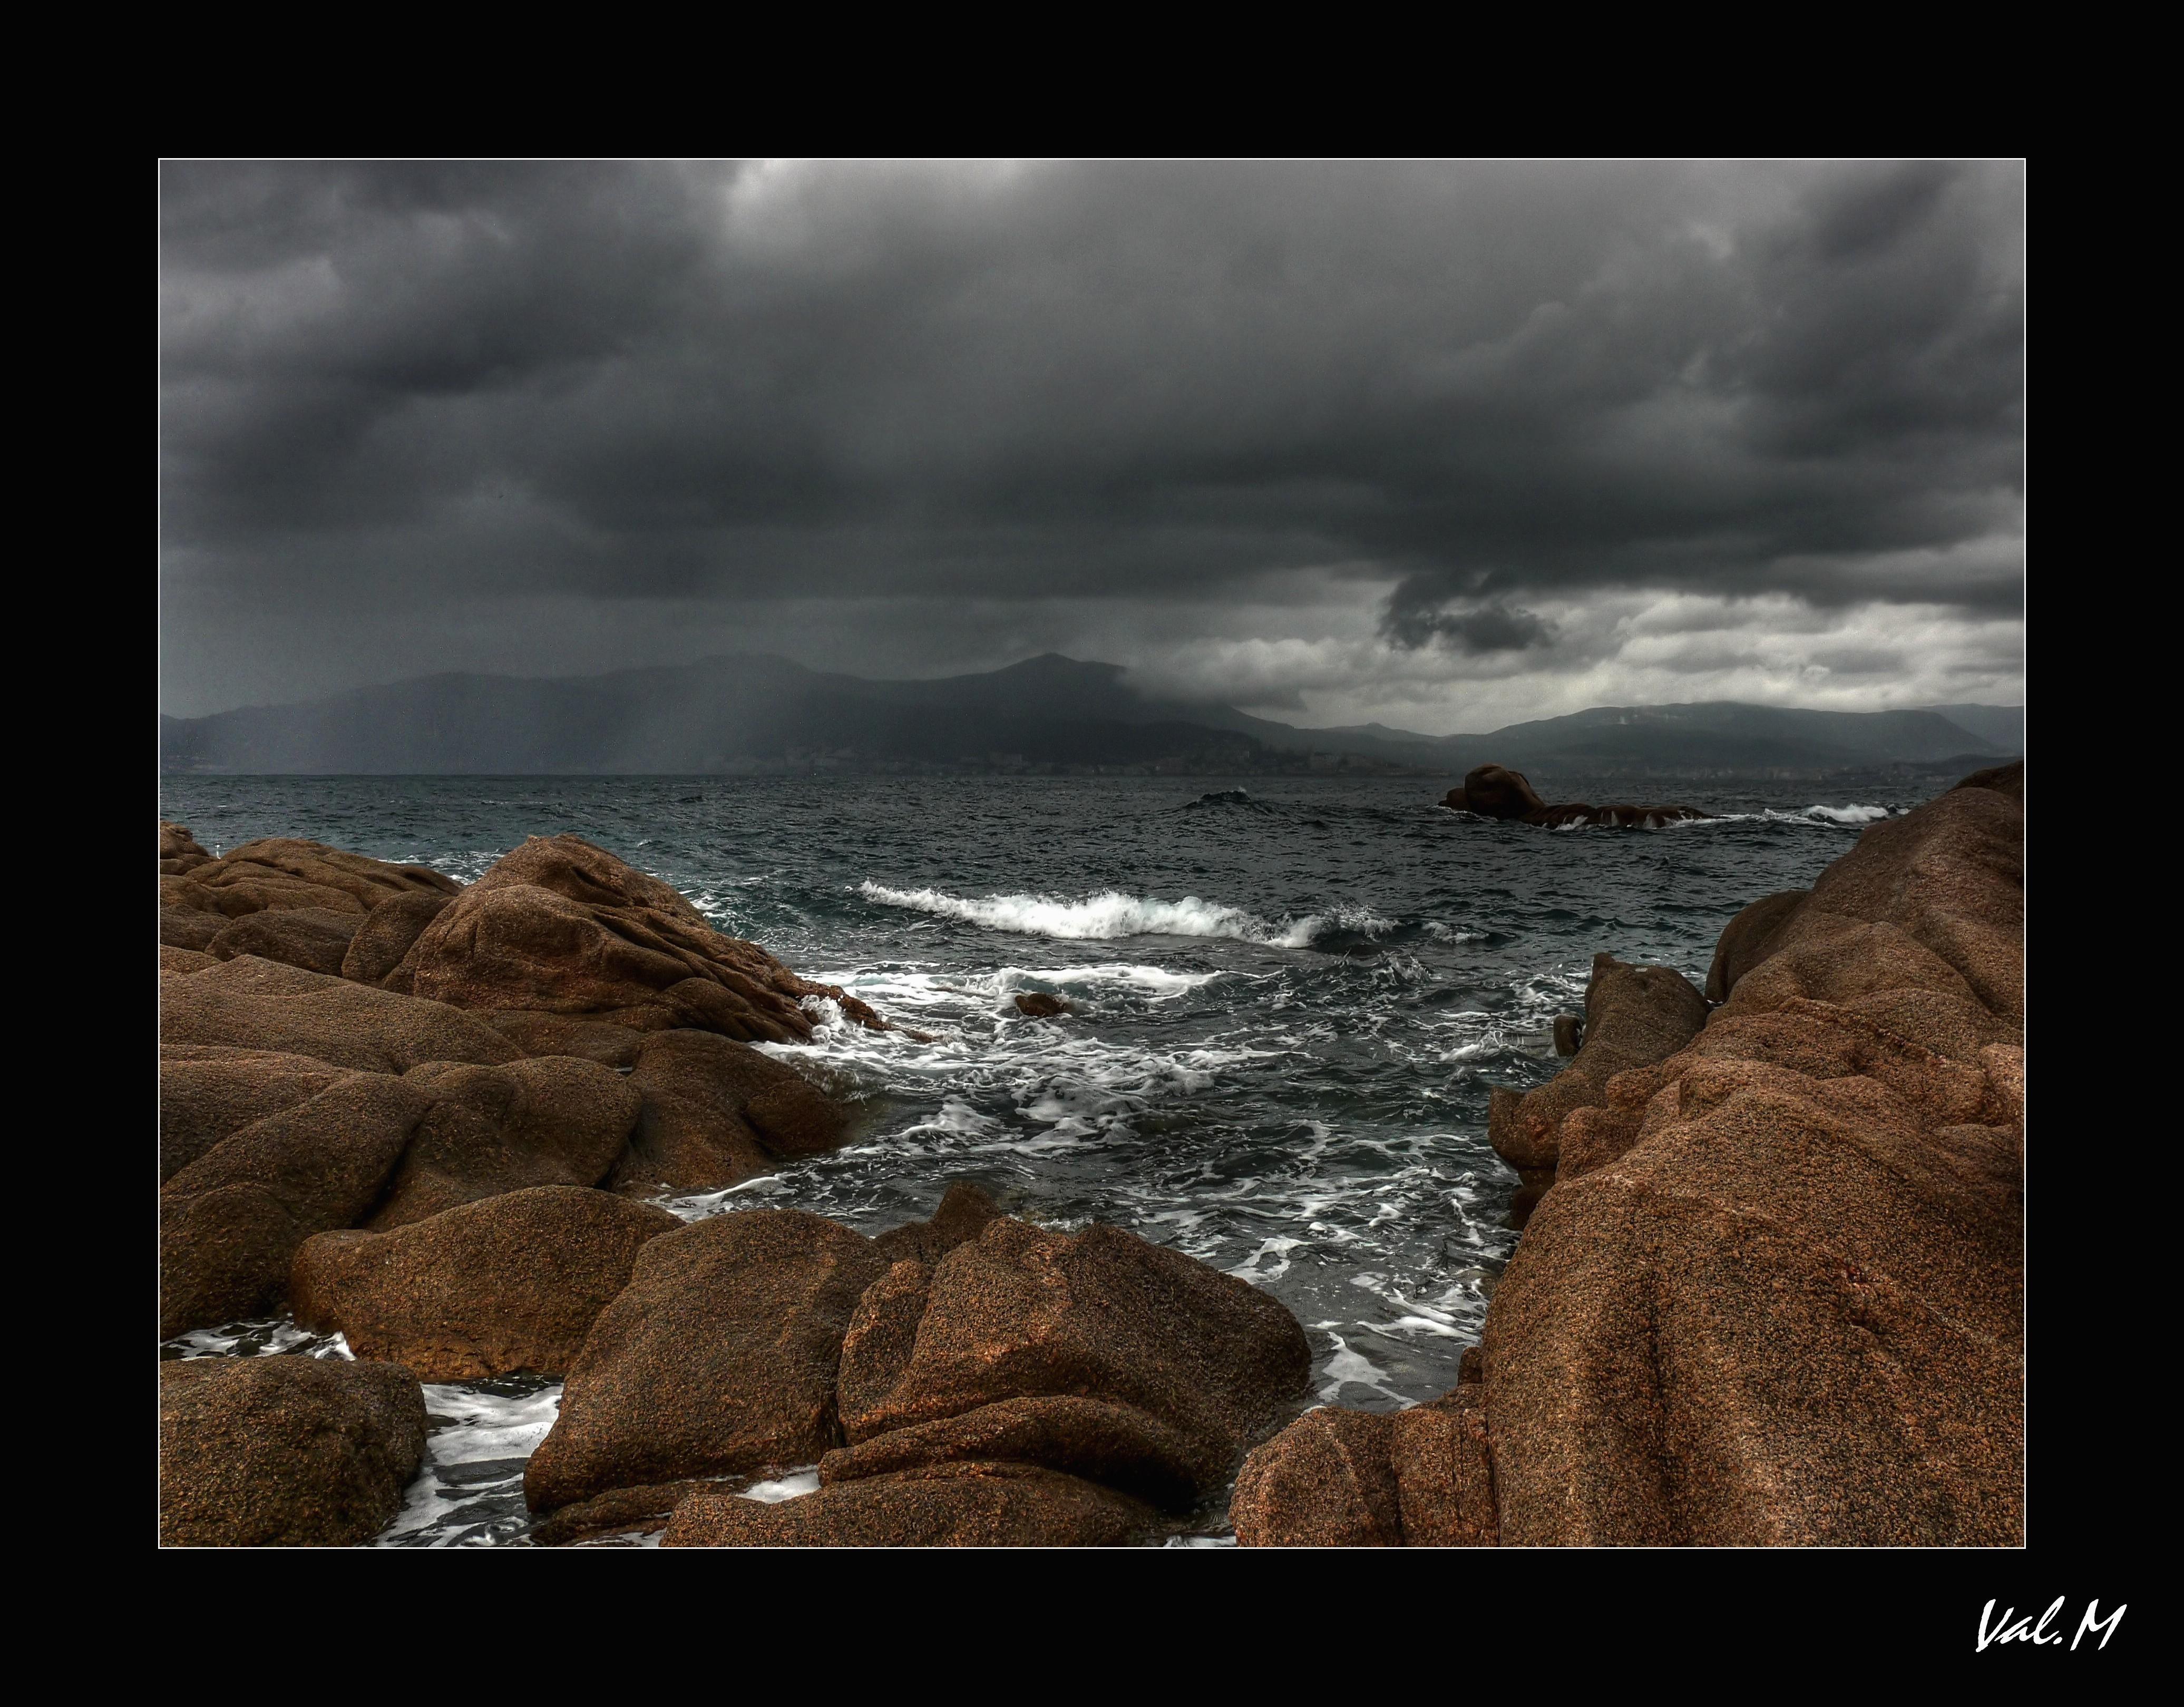 Wallpaper Landscape Sea Mediterranean Rock Shore Sky Calm